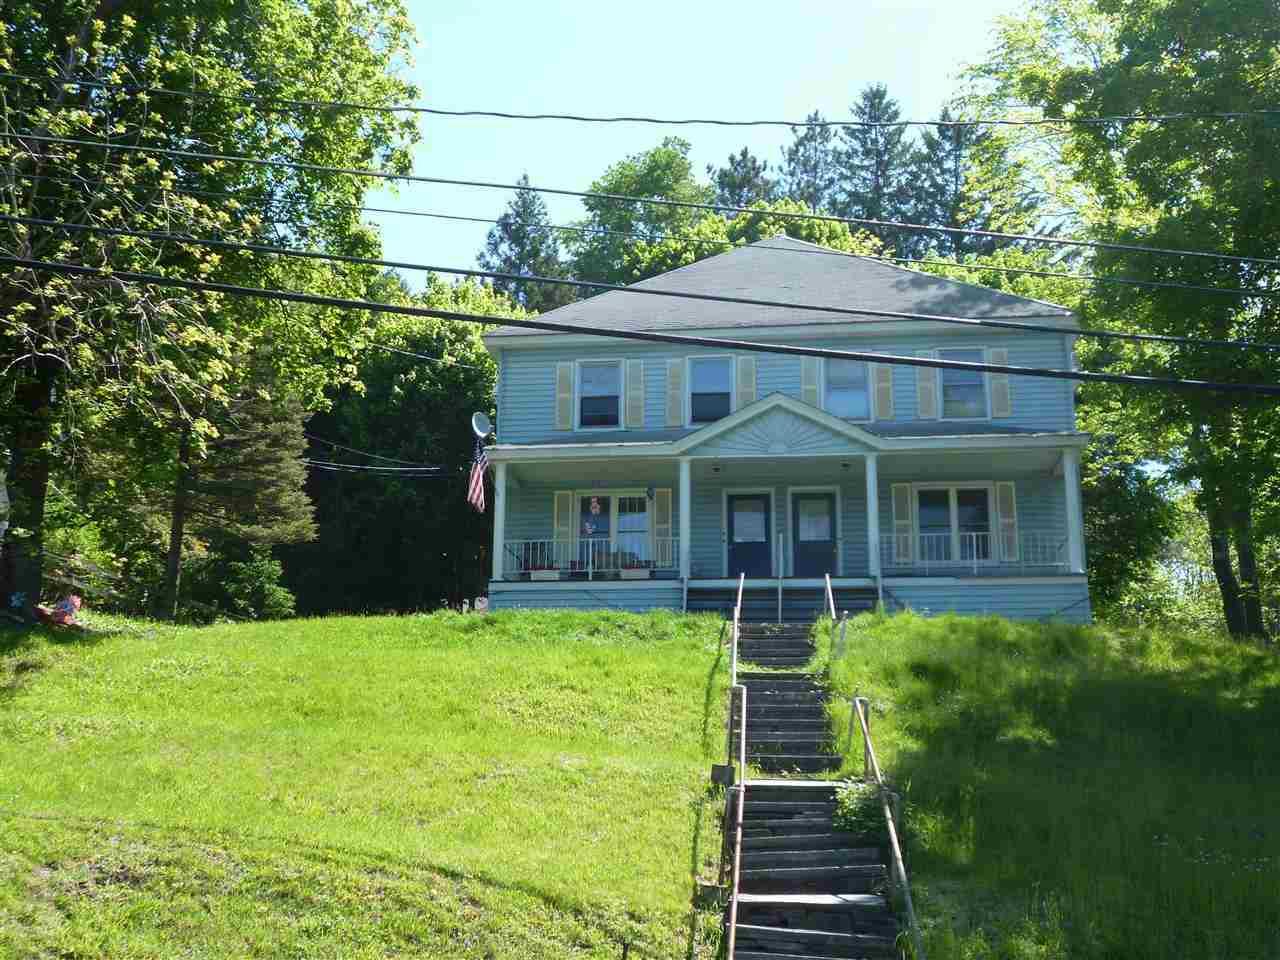 House Front 2.JPG